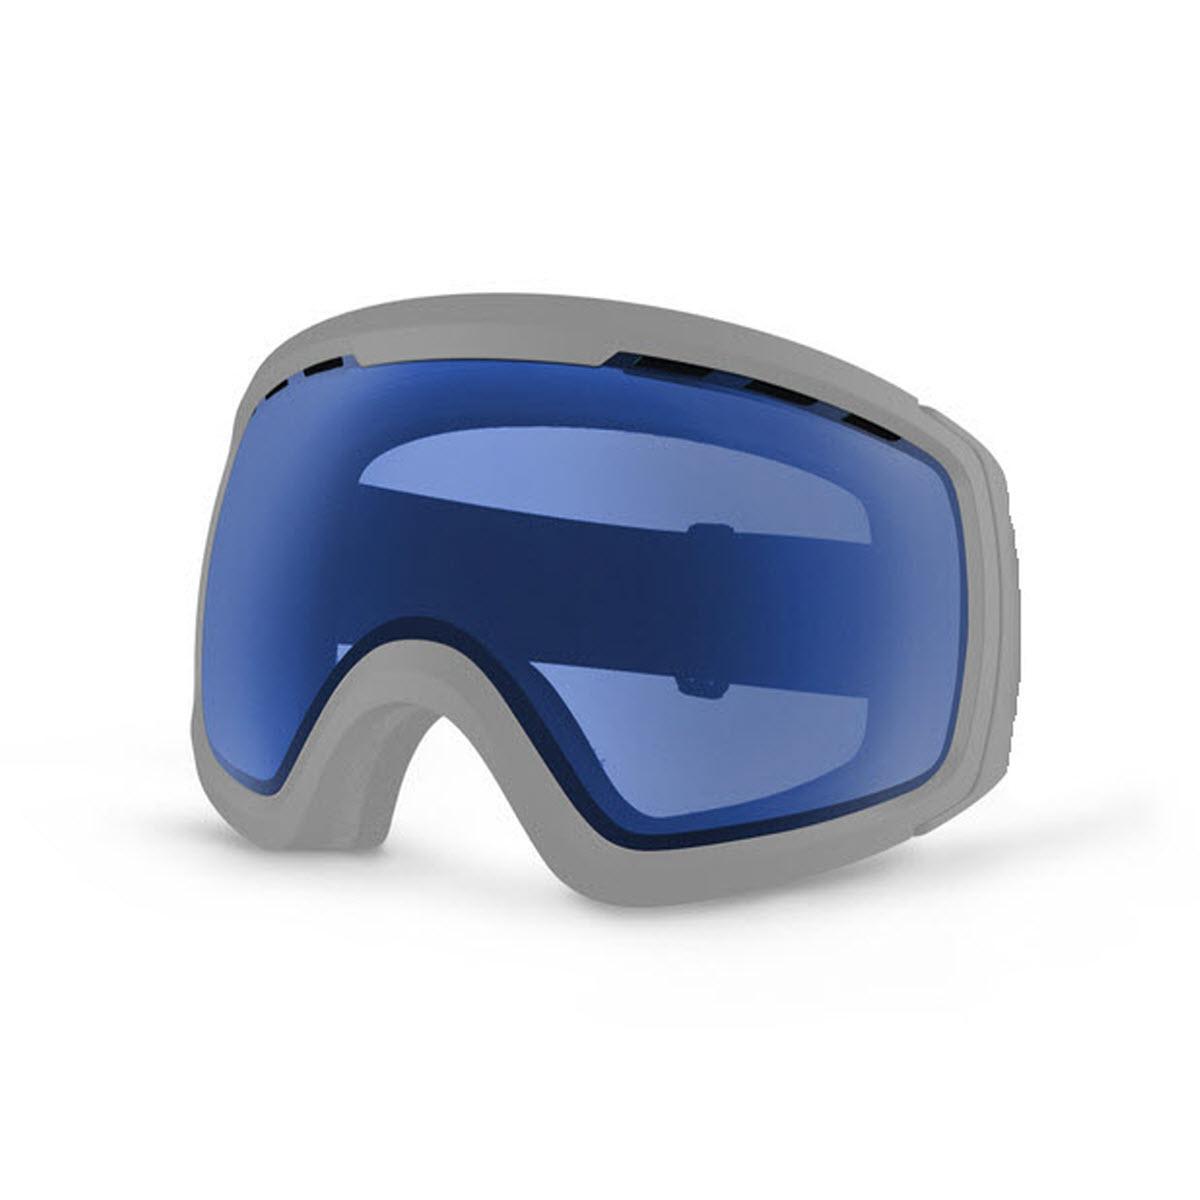 235e23507815 VON ZIPPER Feenom NLS Goggles Replacement Lens - Nightstalker ...